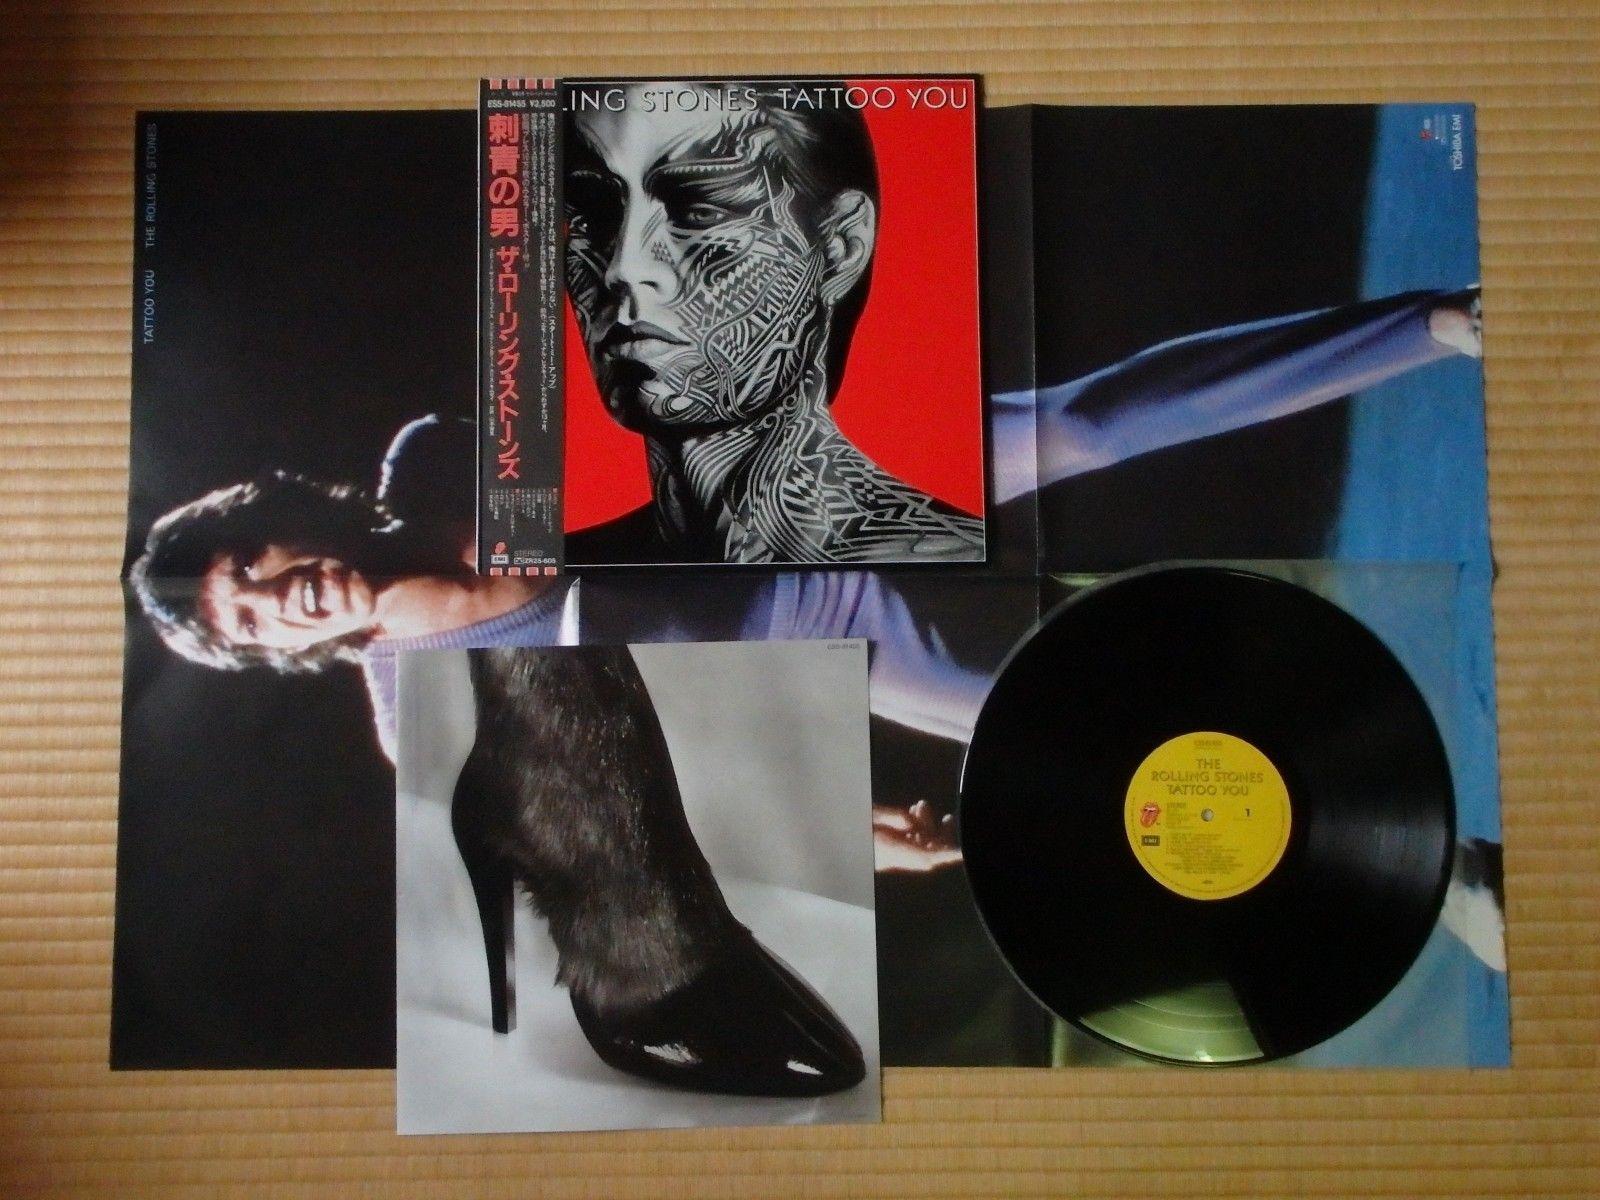 The Rolling Stones –Tattoo You ESS-81455 1st Japan pressing Poster Obi Near Mint